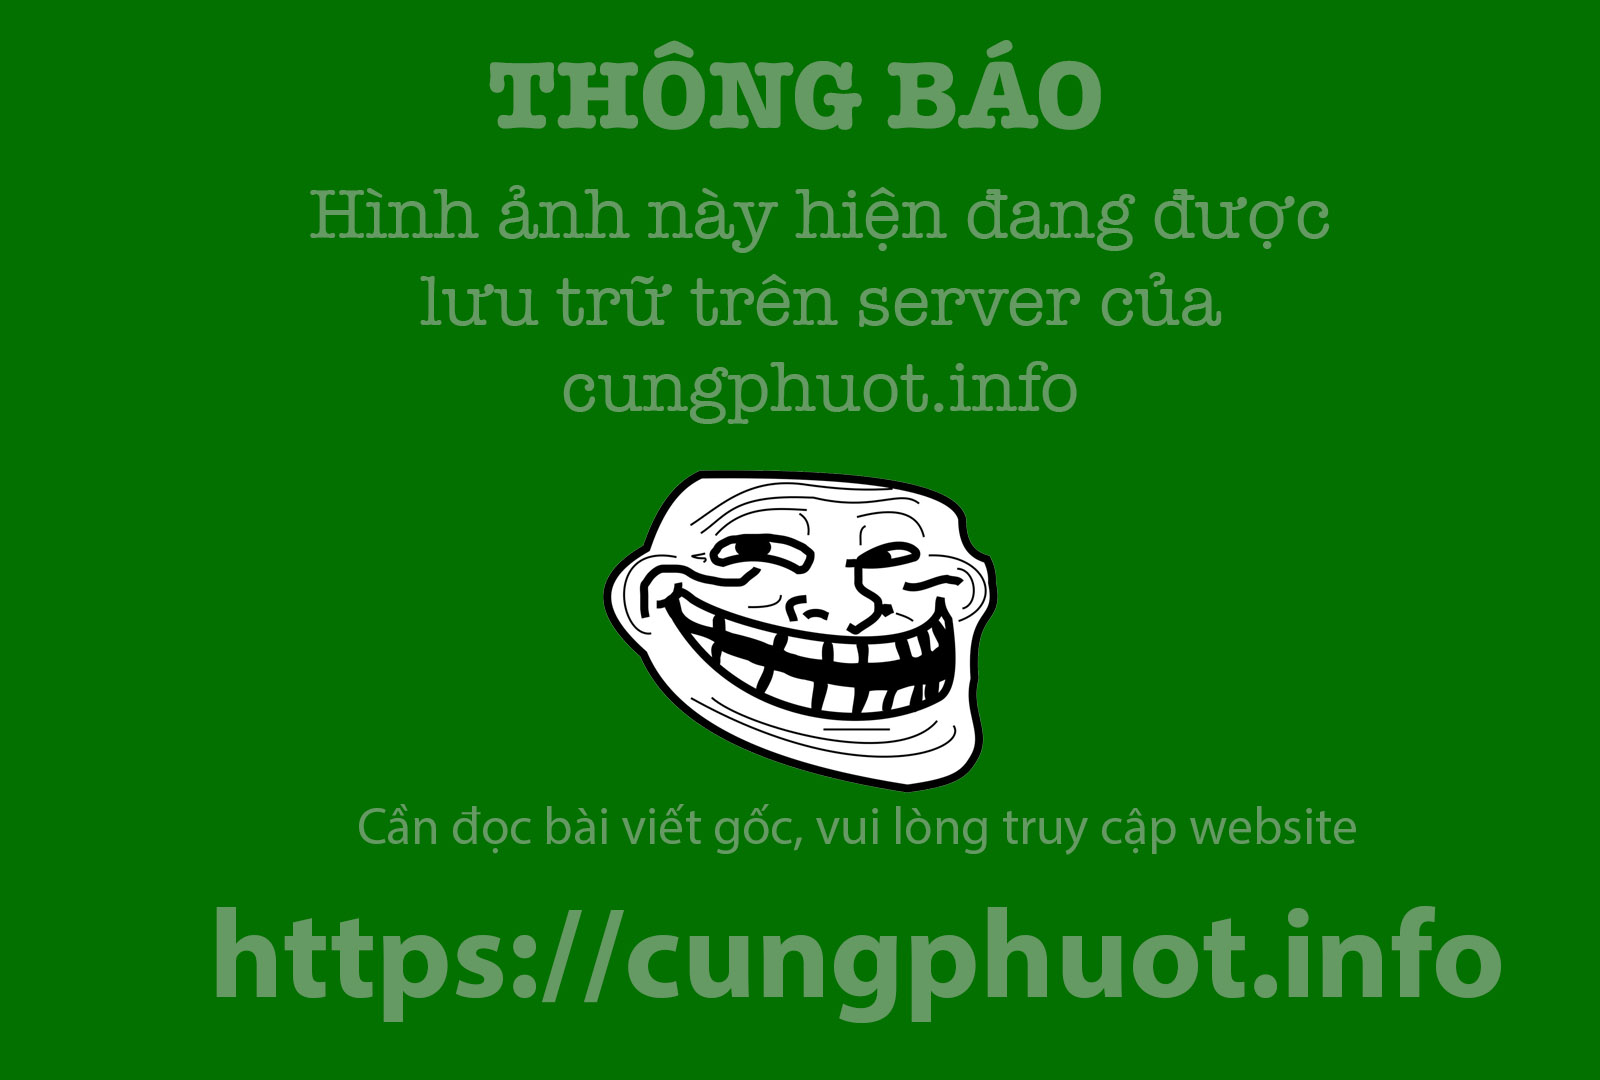 Co do Hue dep la trong suong mu hinh anh 2